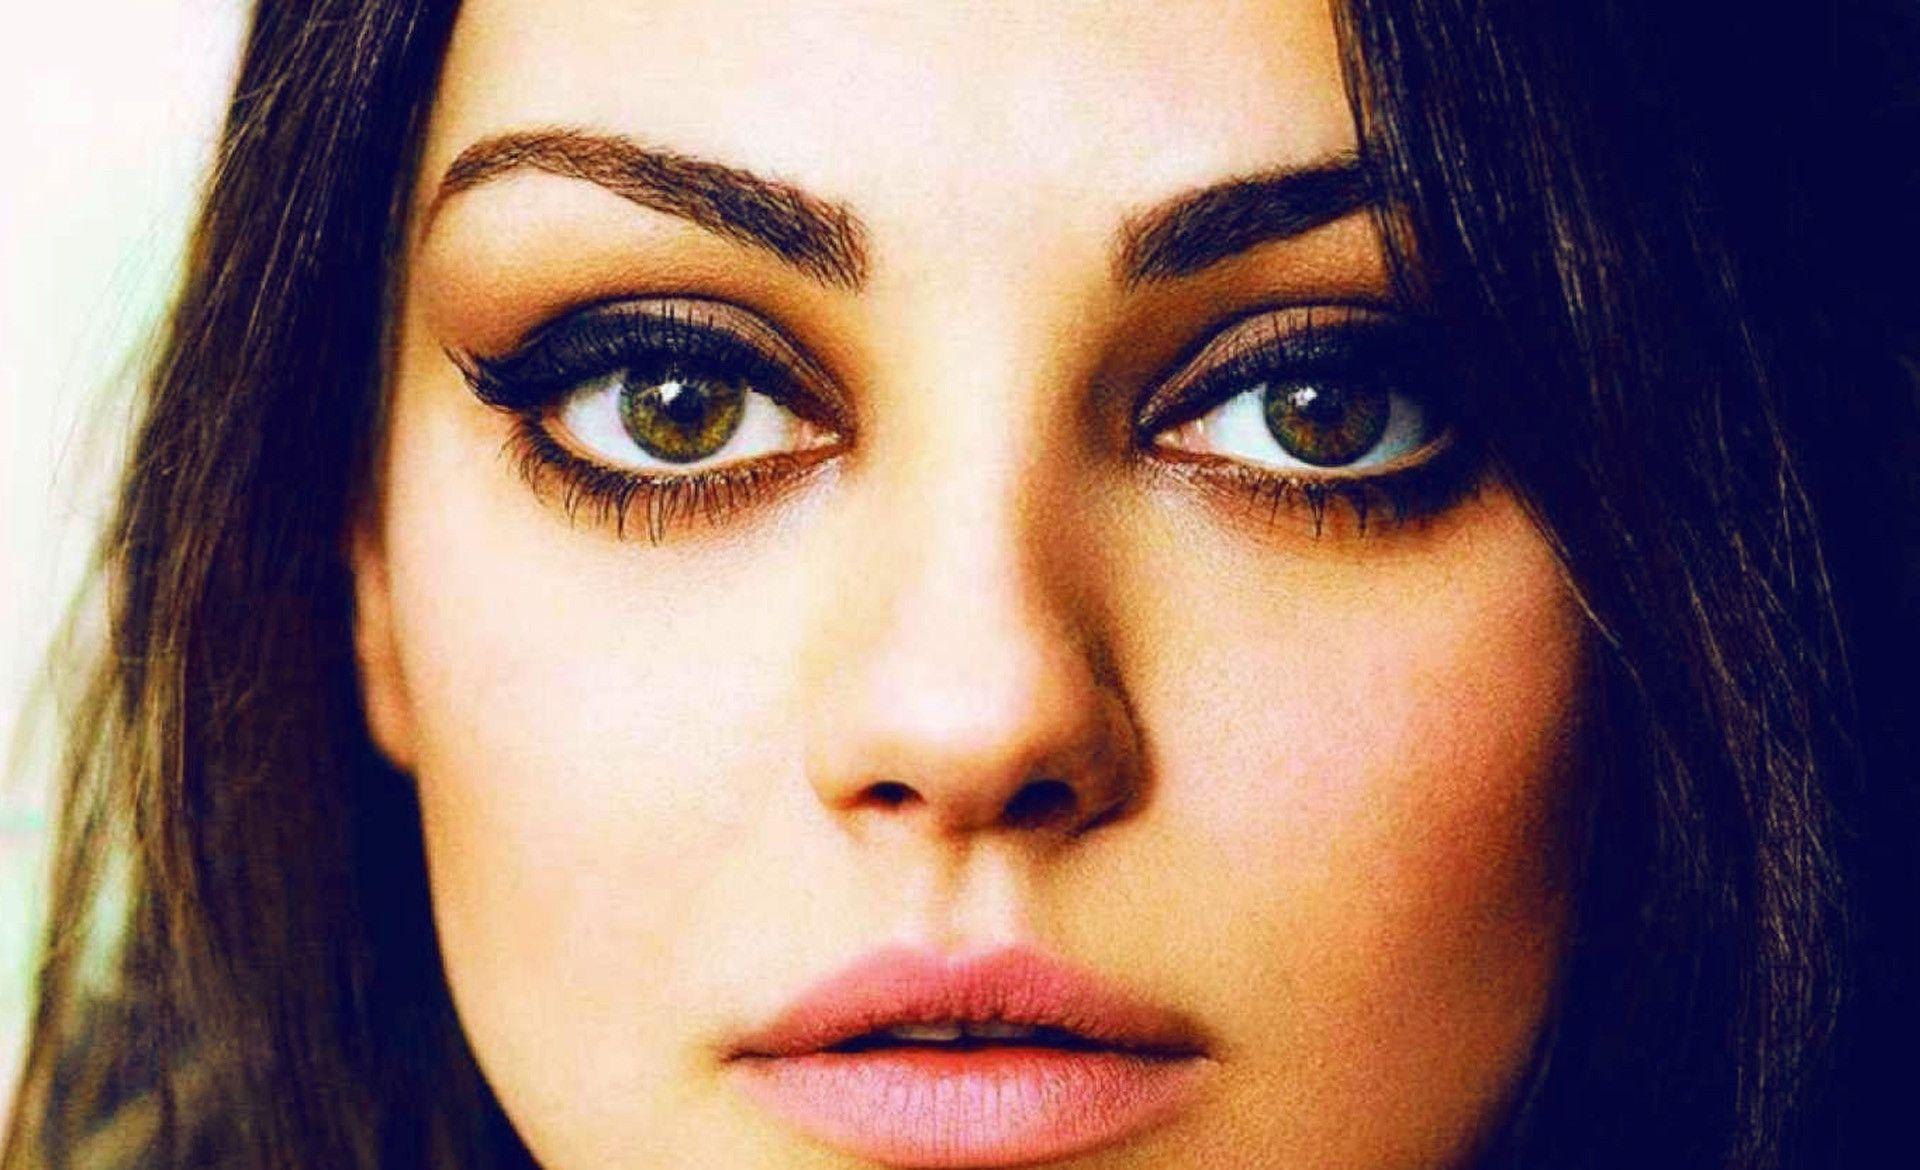 Mila Kunis Eye Wallpaper HD - dlwallhd.com